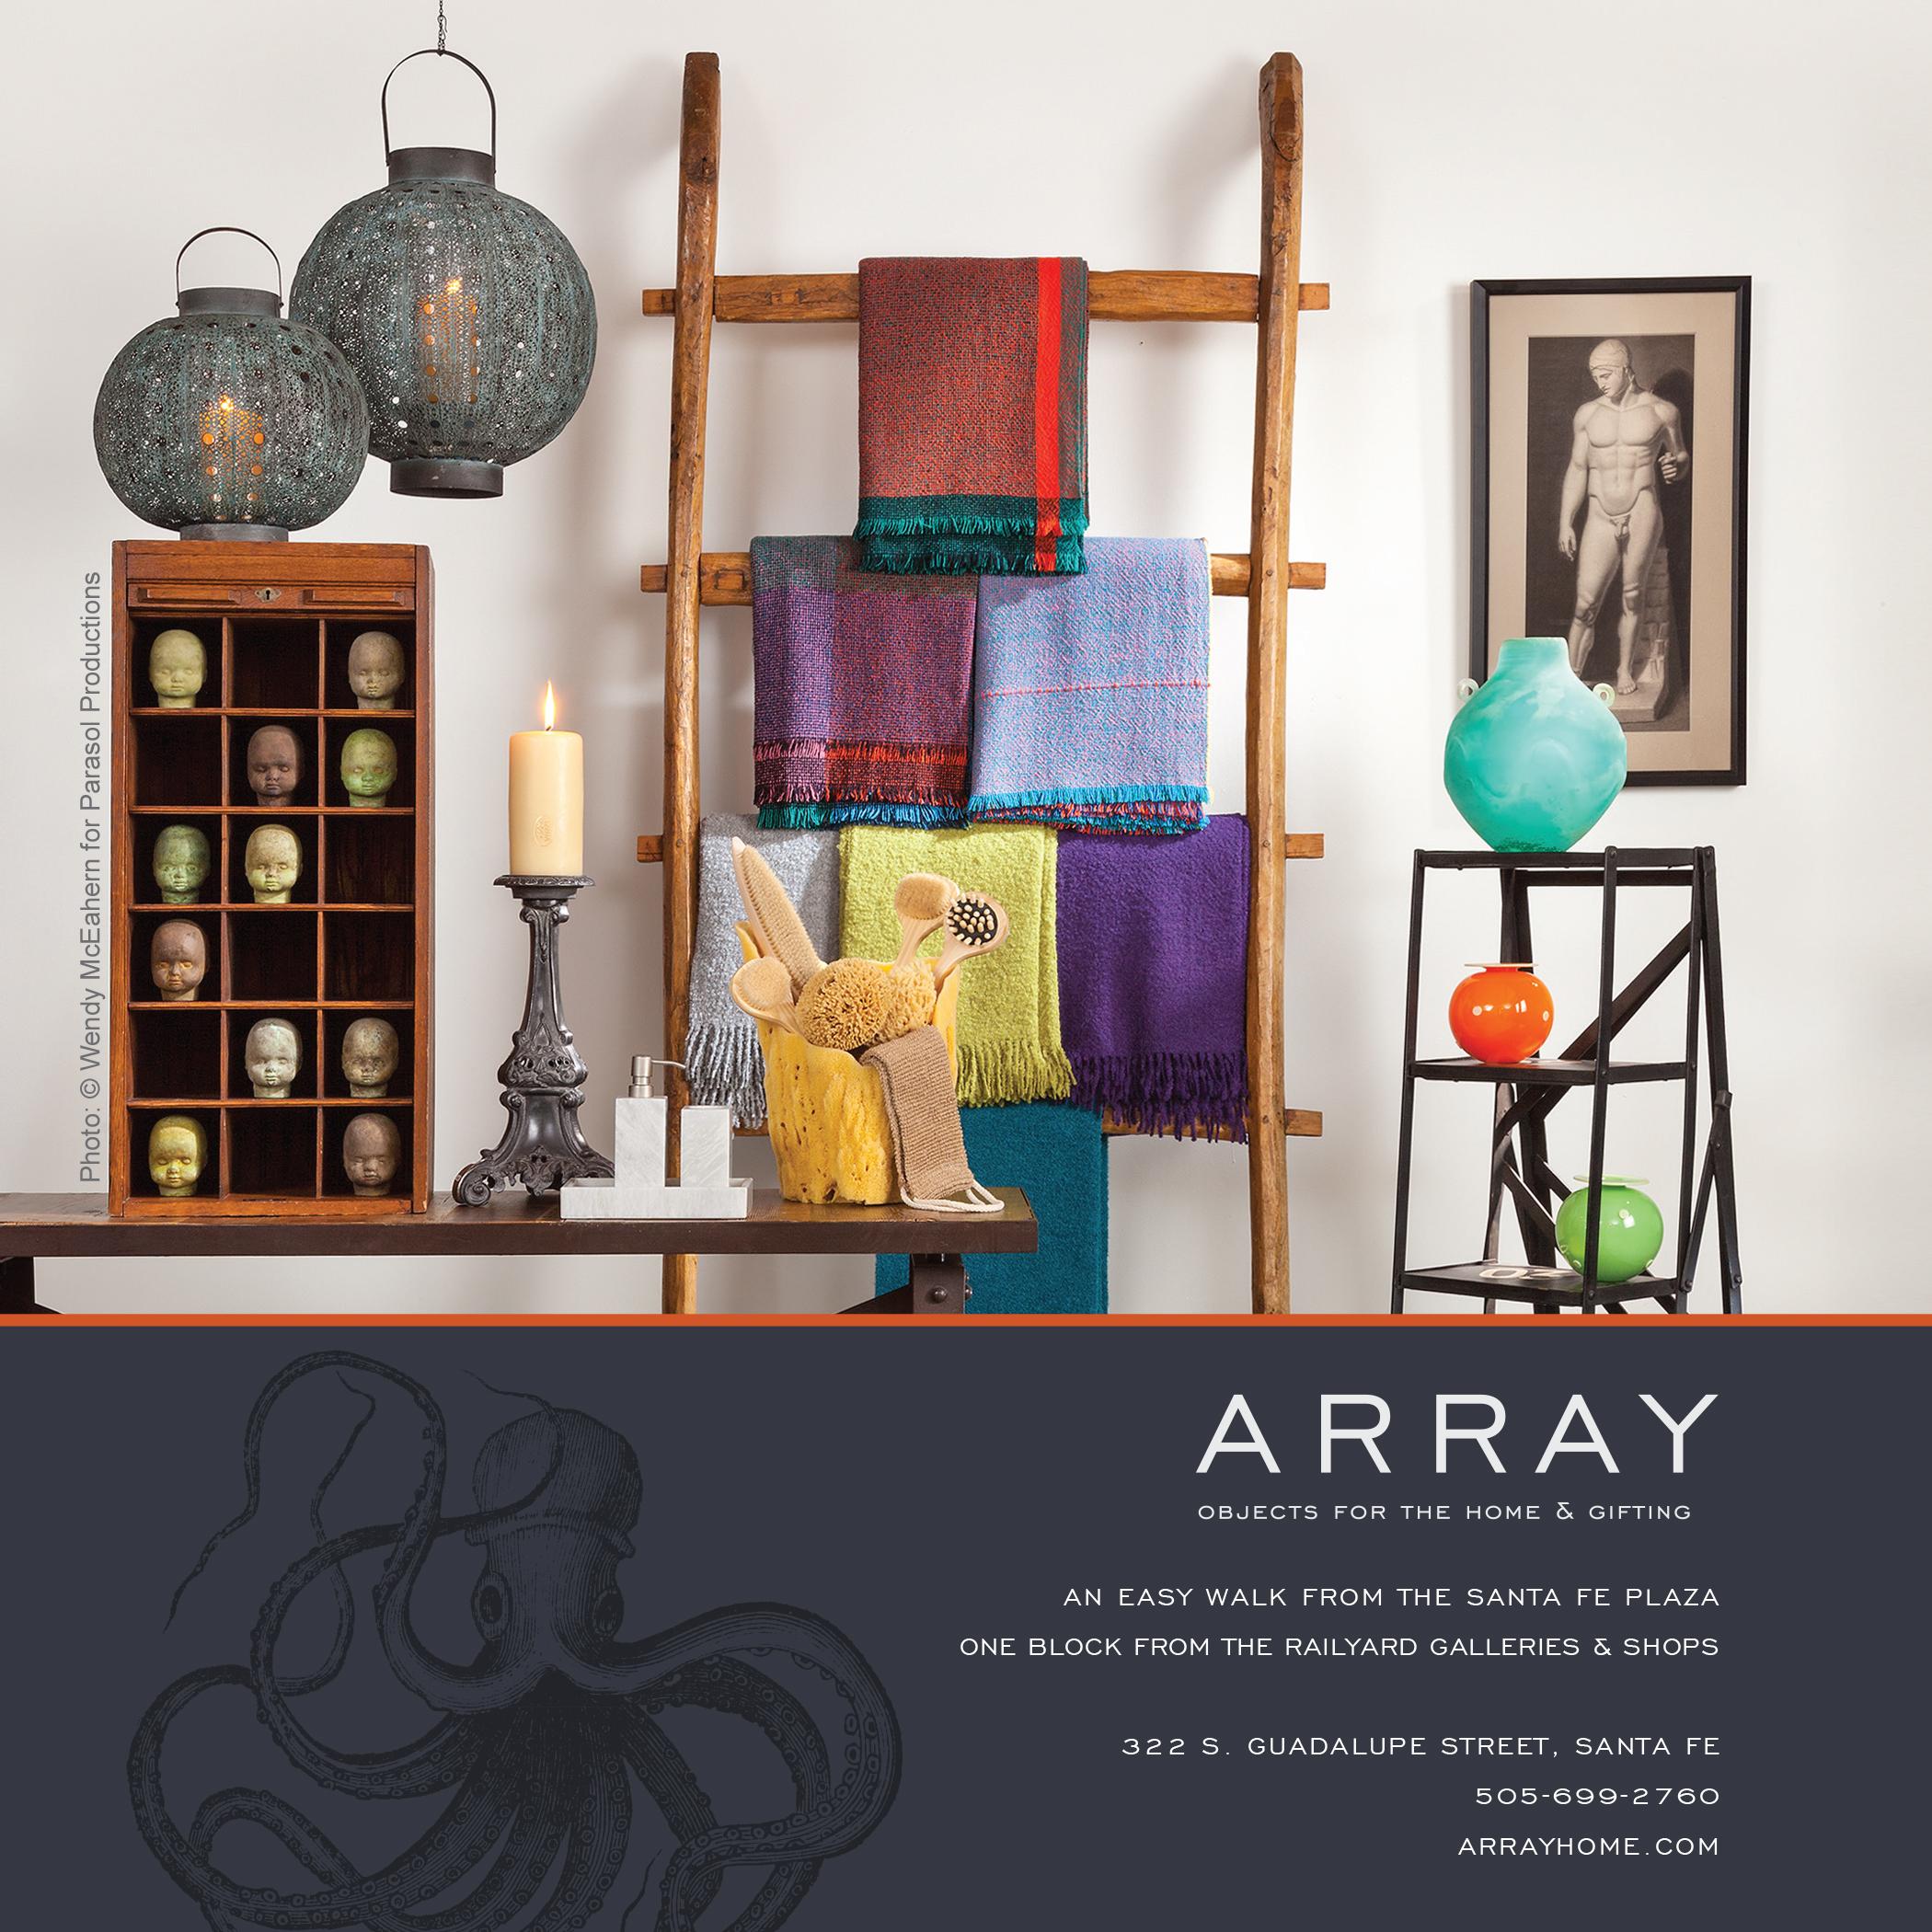 Array_eg-ad_2017.jpg